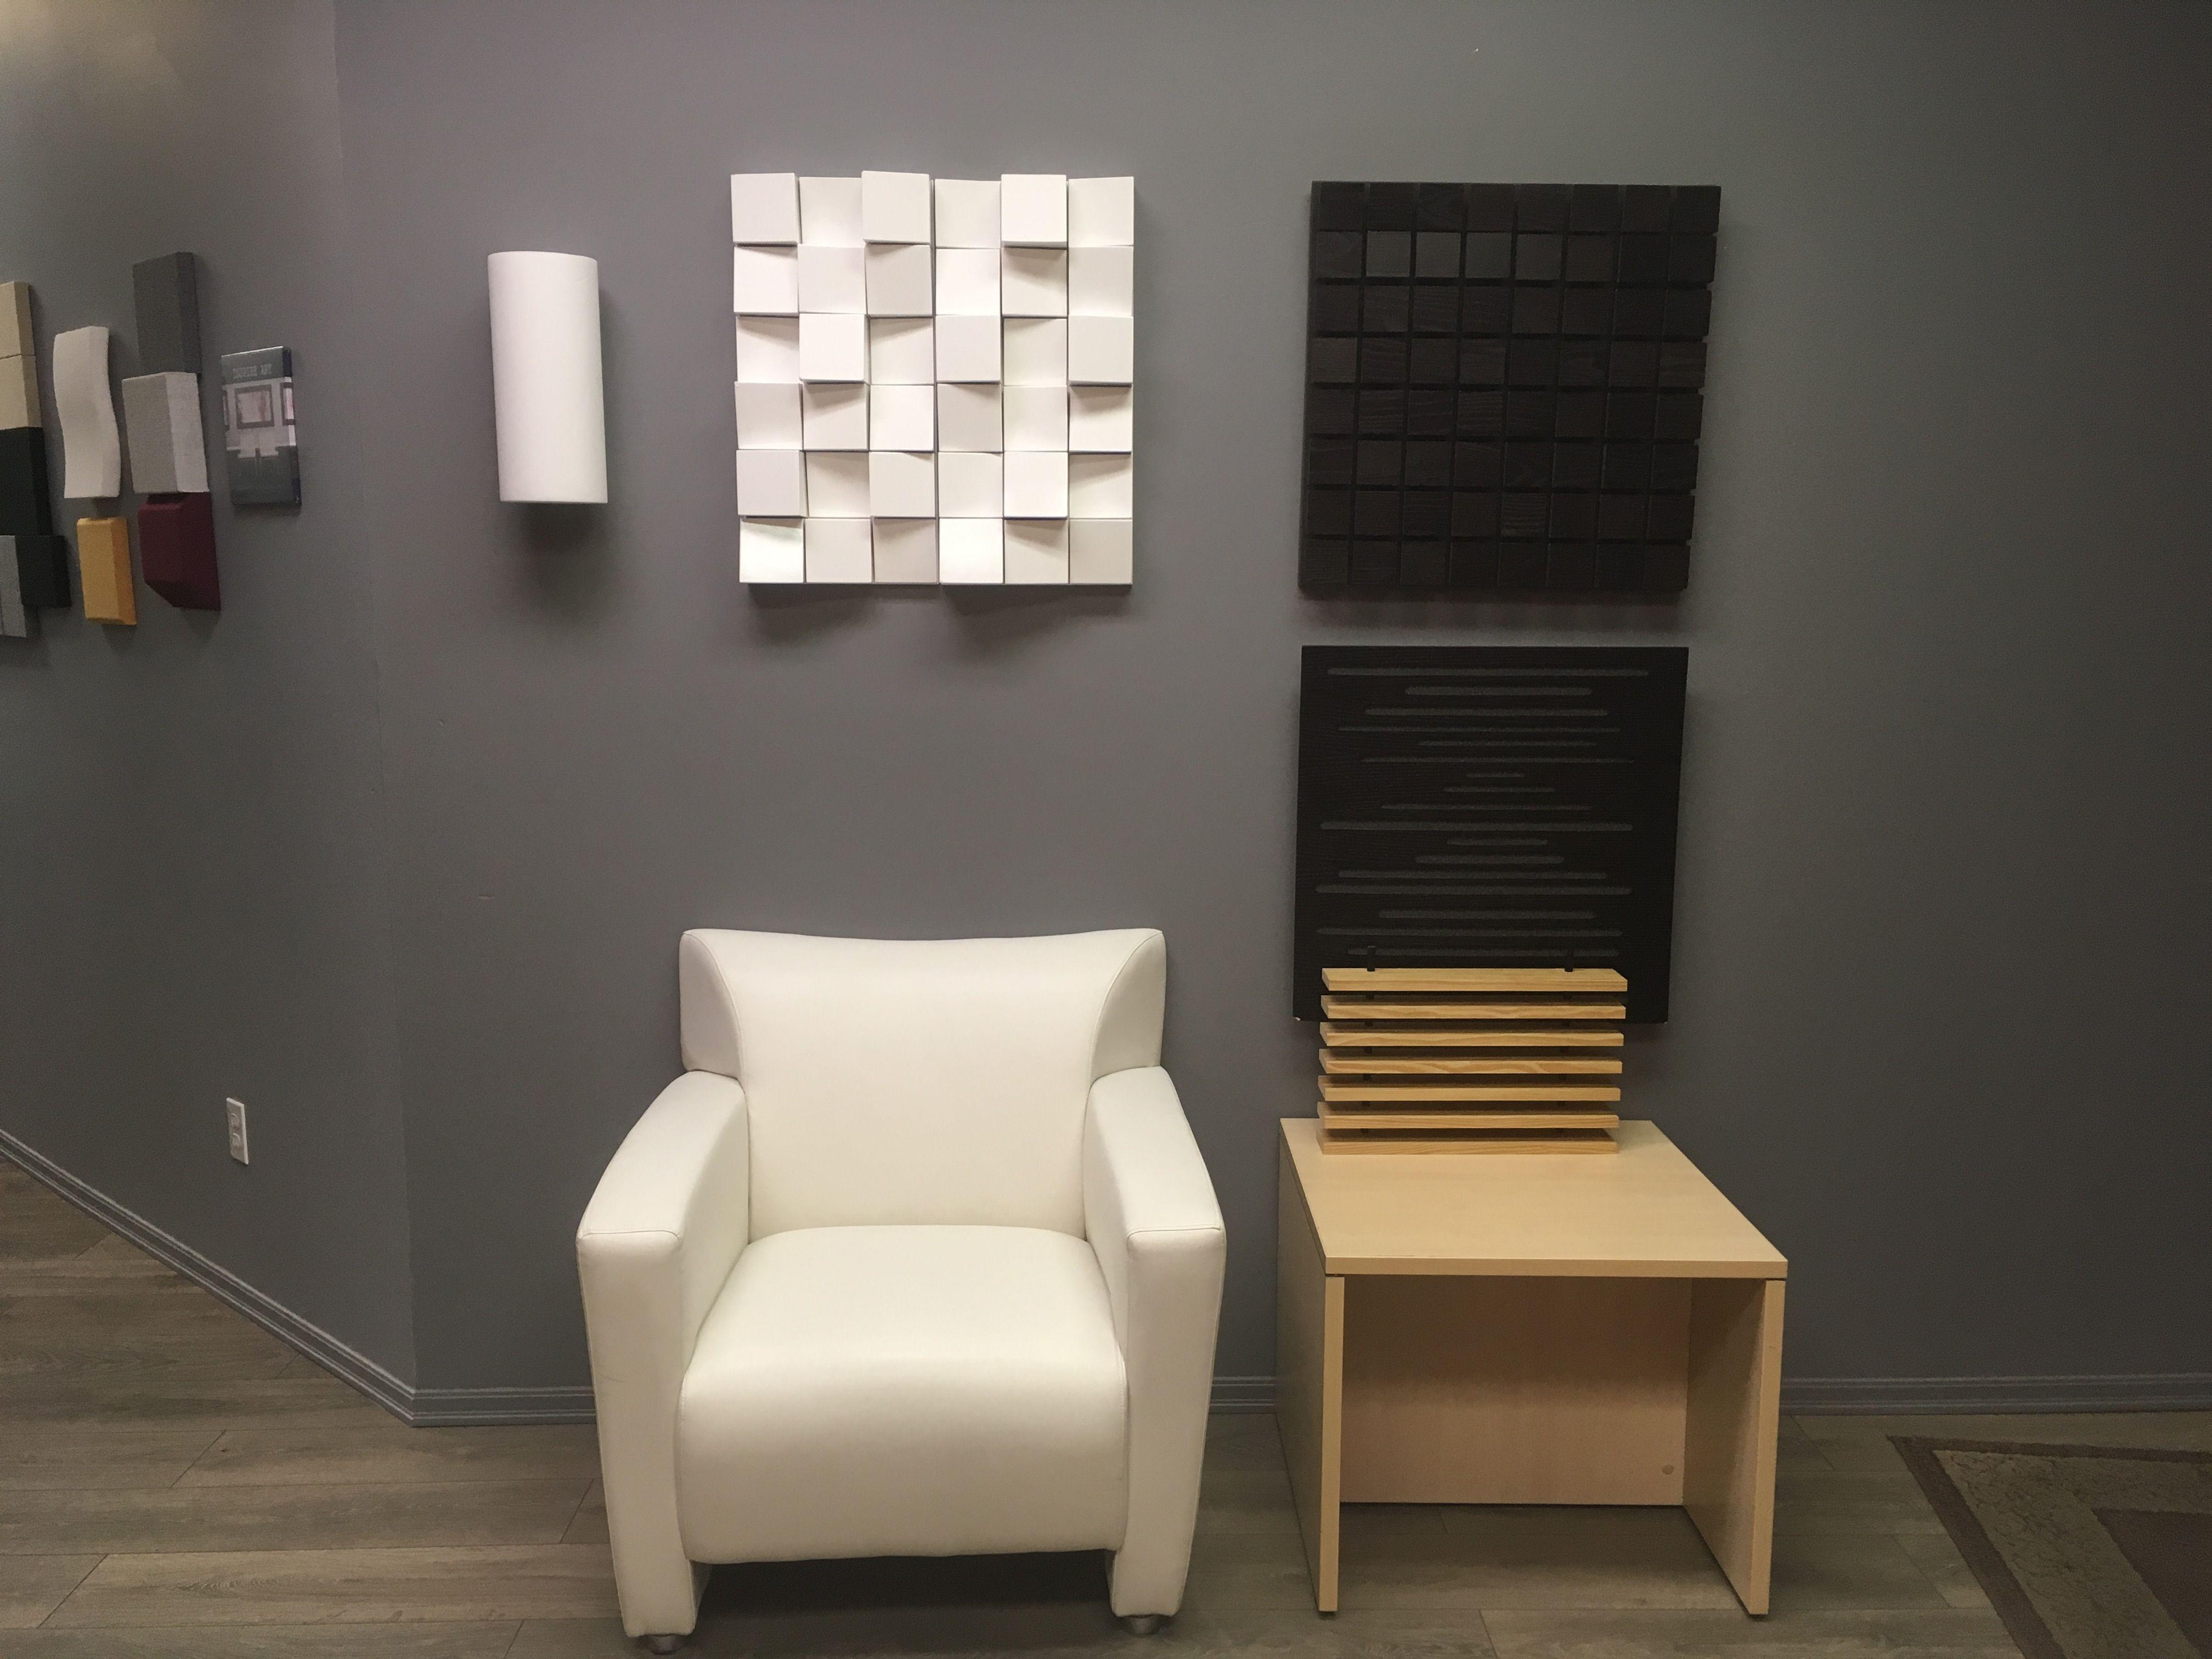 Kirei echopanel geometric tiles building for health - Kirei Echopanel Geometric Tiles Building For Health 48